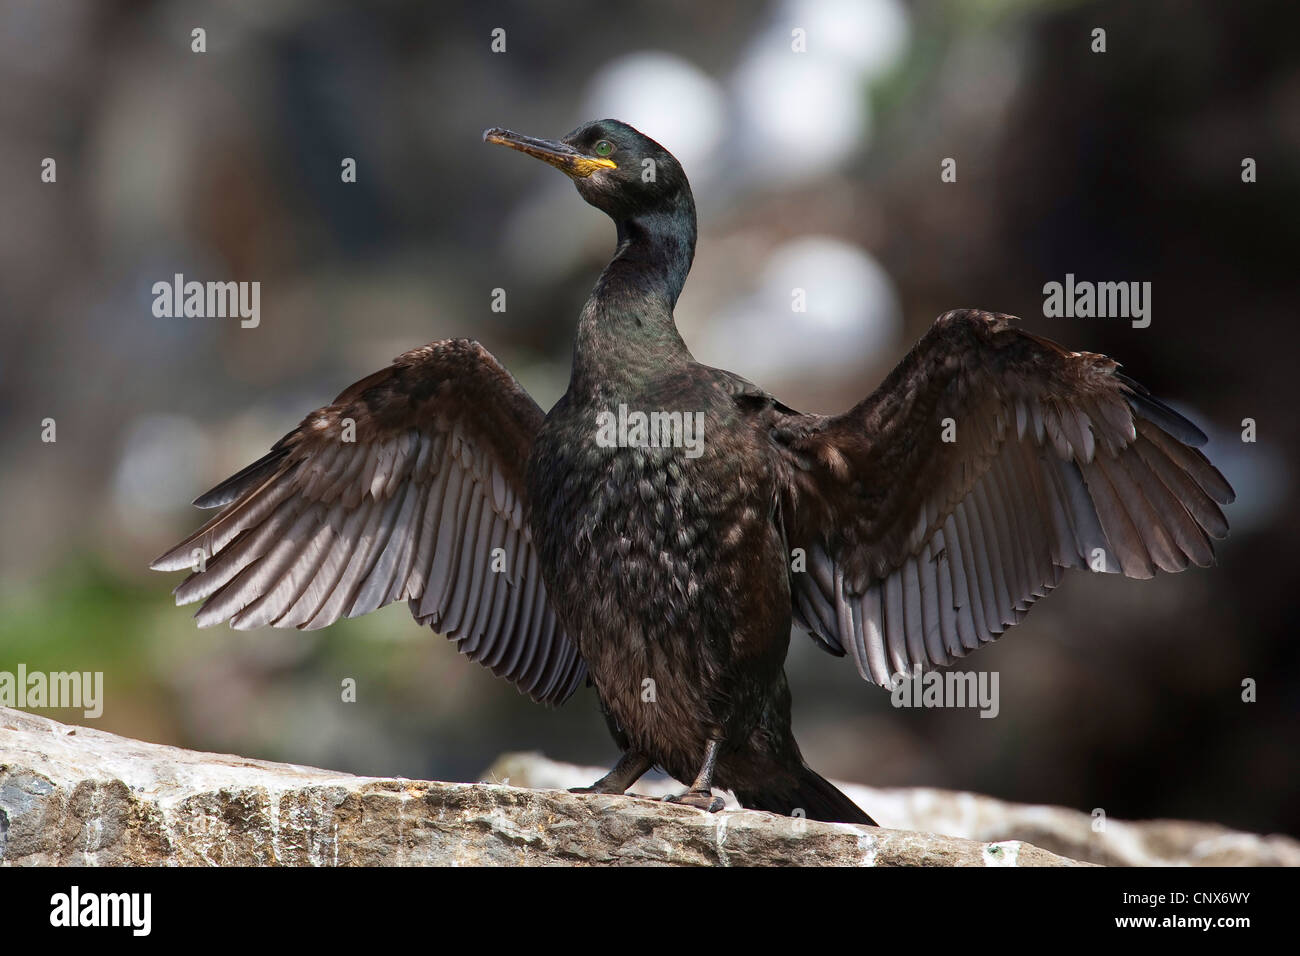 shag (Phalacrocorax aristotelis), drying its wings, Germany - Stock Image